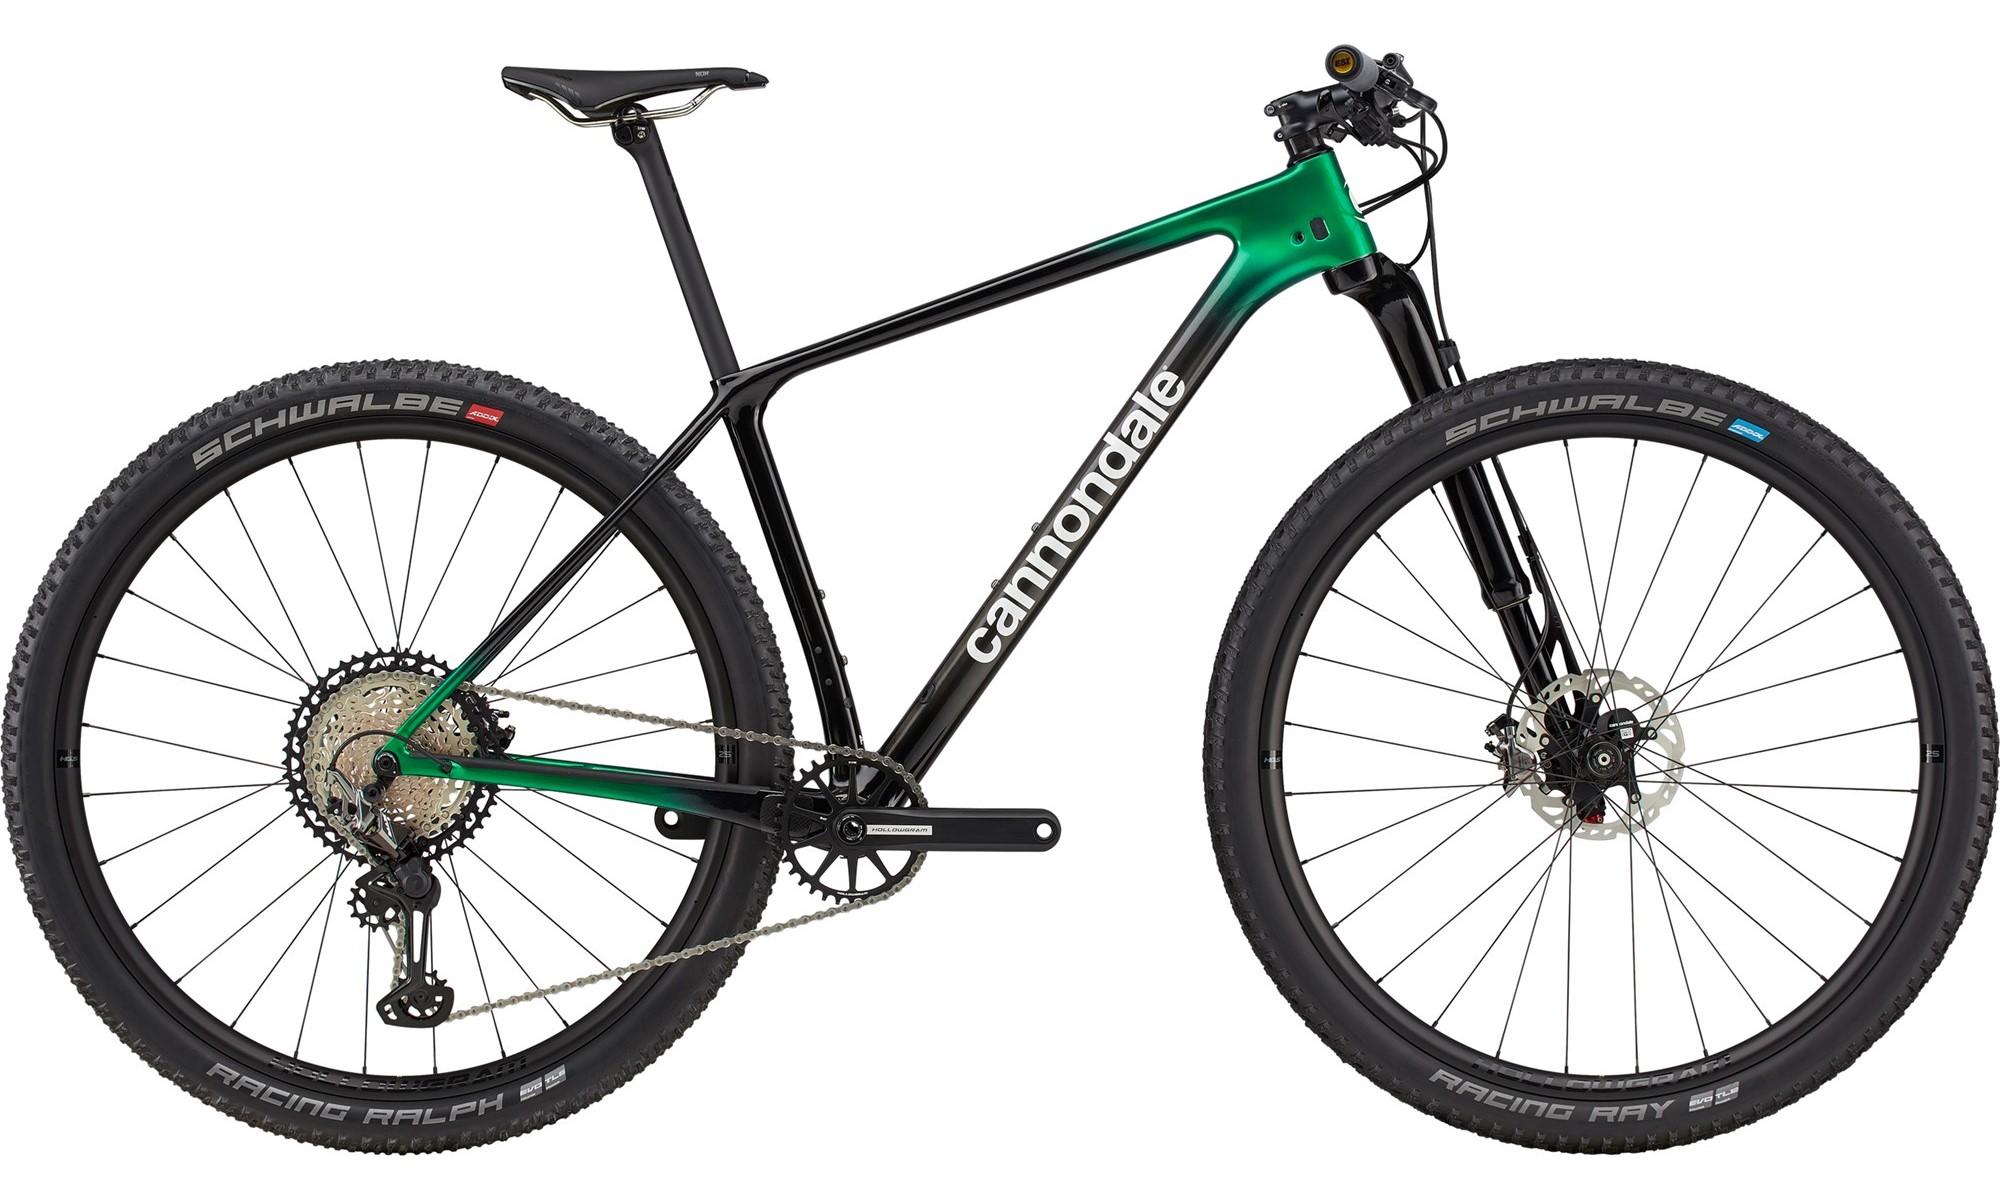 Cannondale F-Si Hi Mod 1 Shimano XTR Mountain Bike 2021 Team Replica